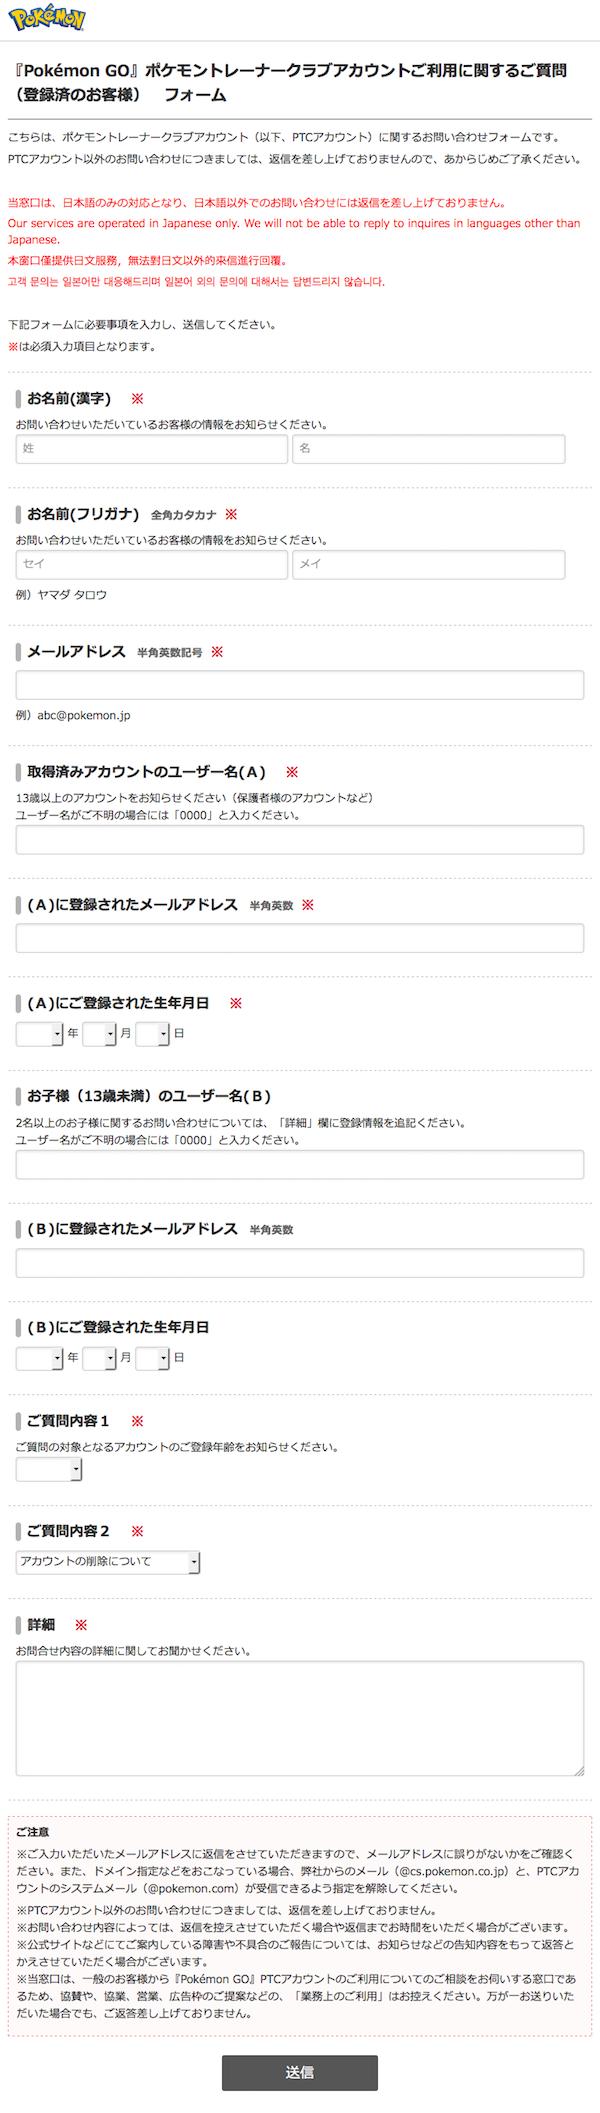 Pokemon_Trainer_Club-04